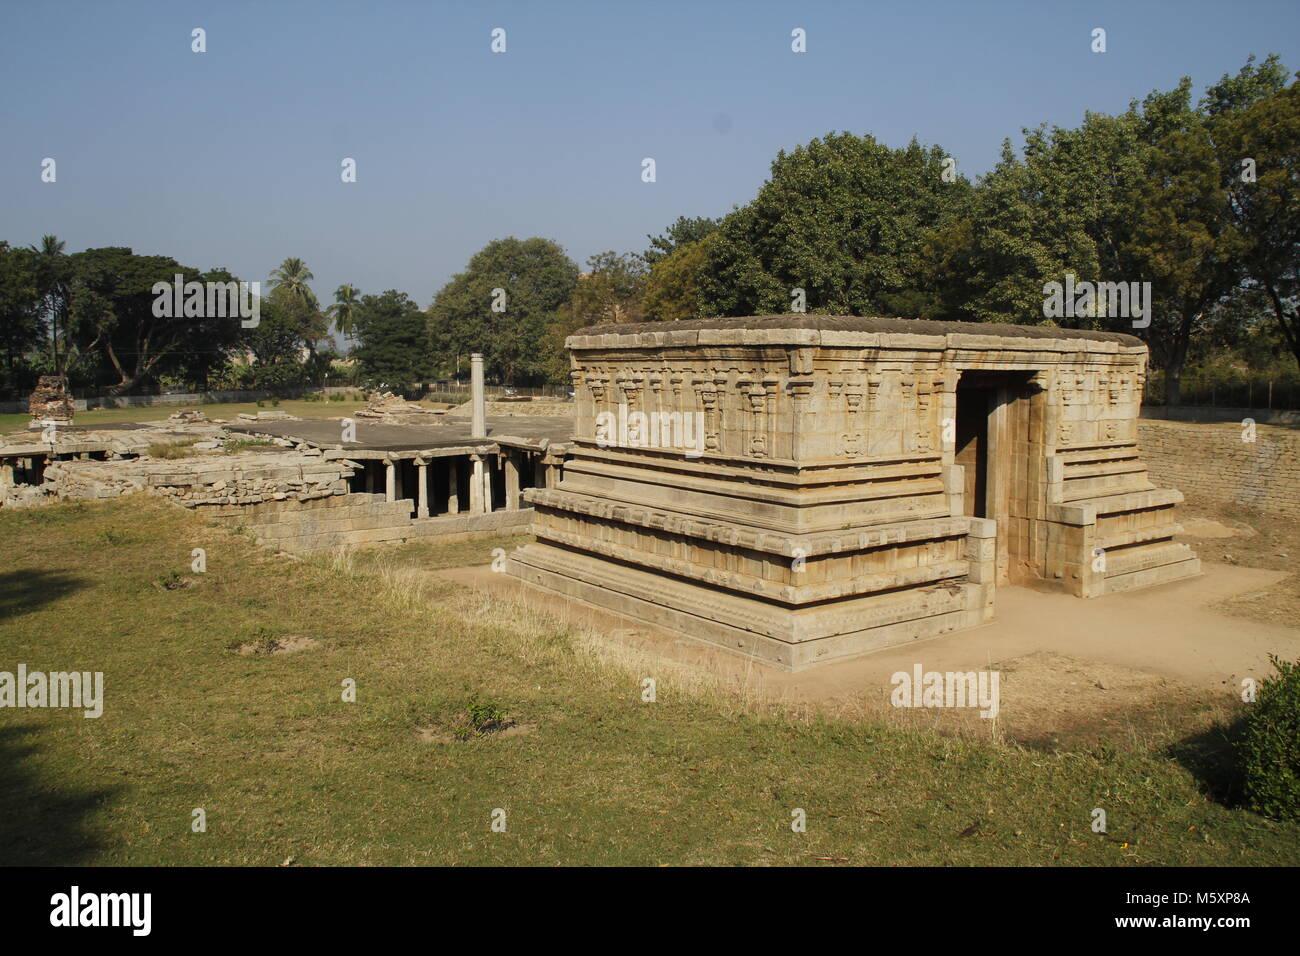 The submerged shiva temple at Hampi - Stock Image